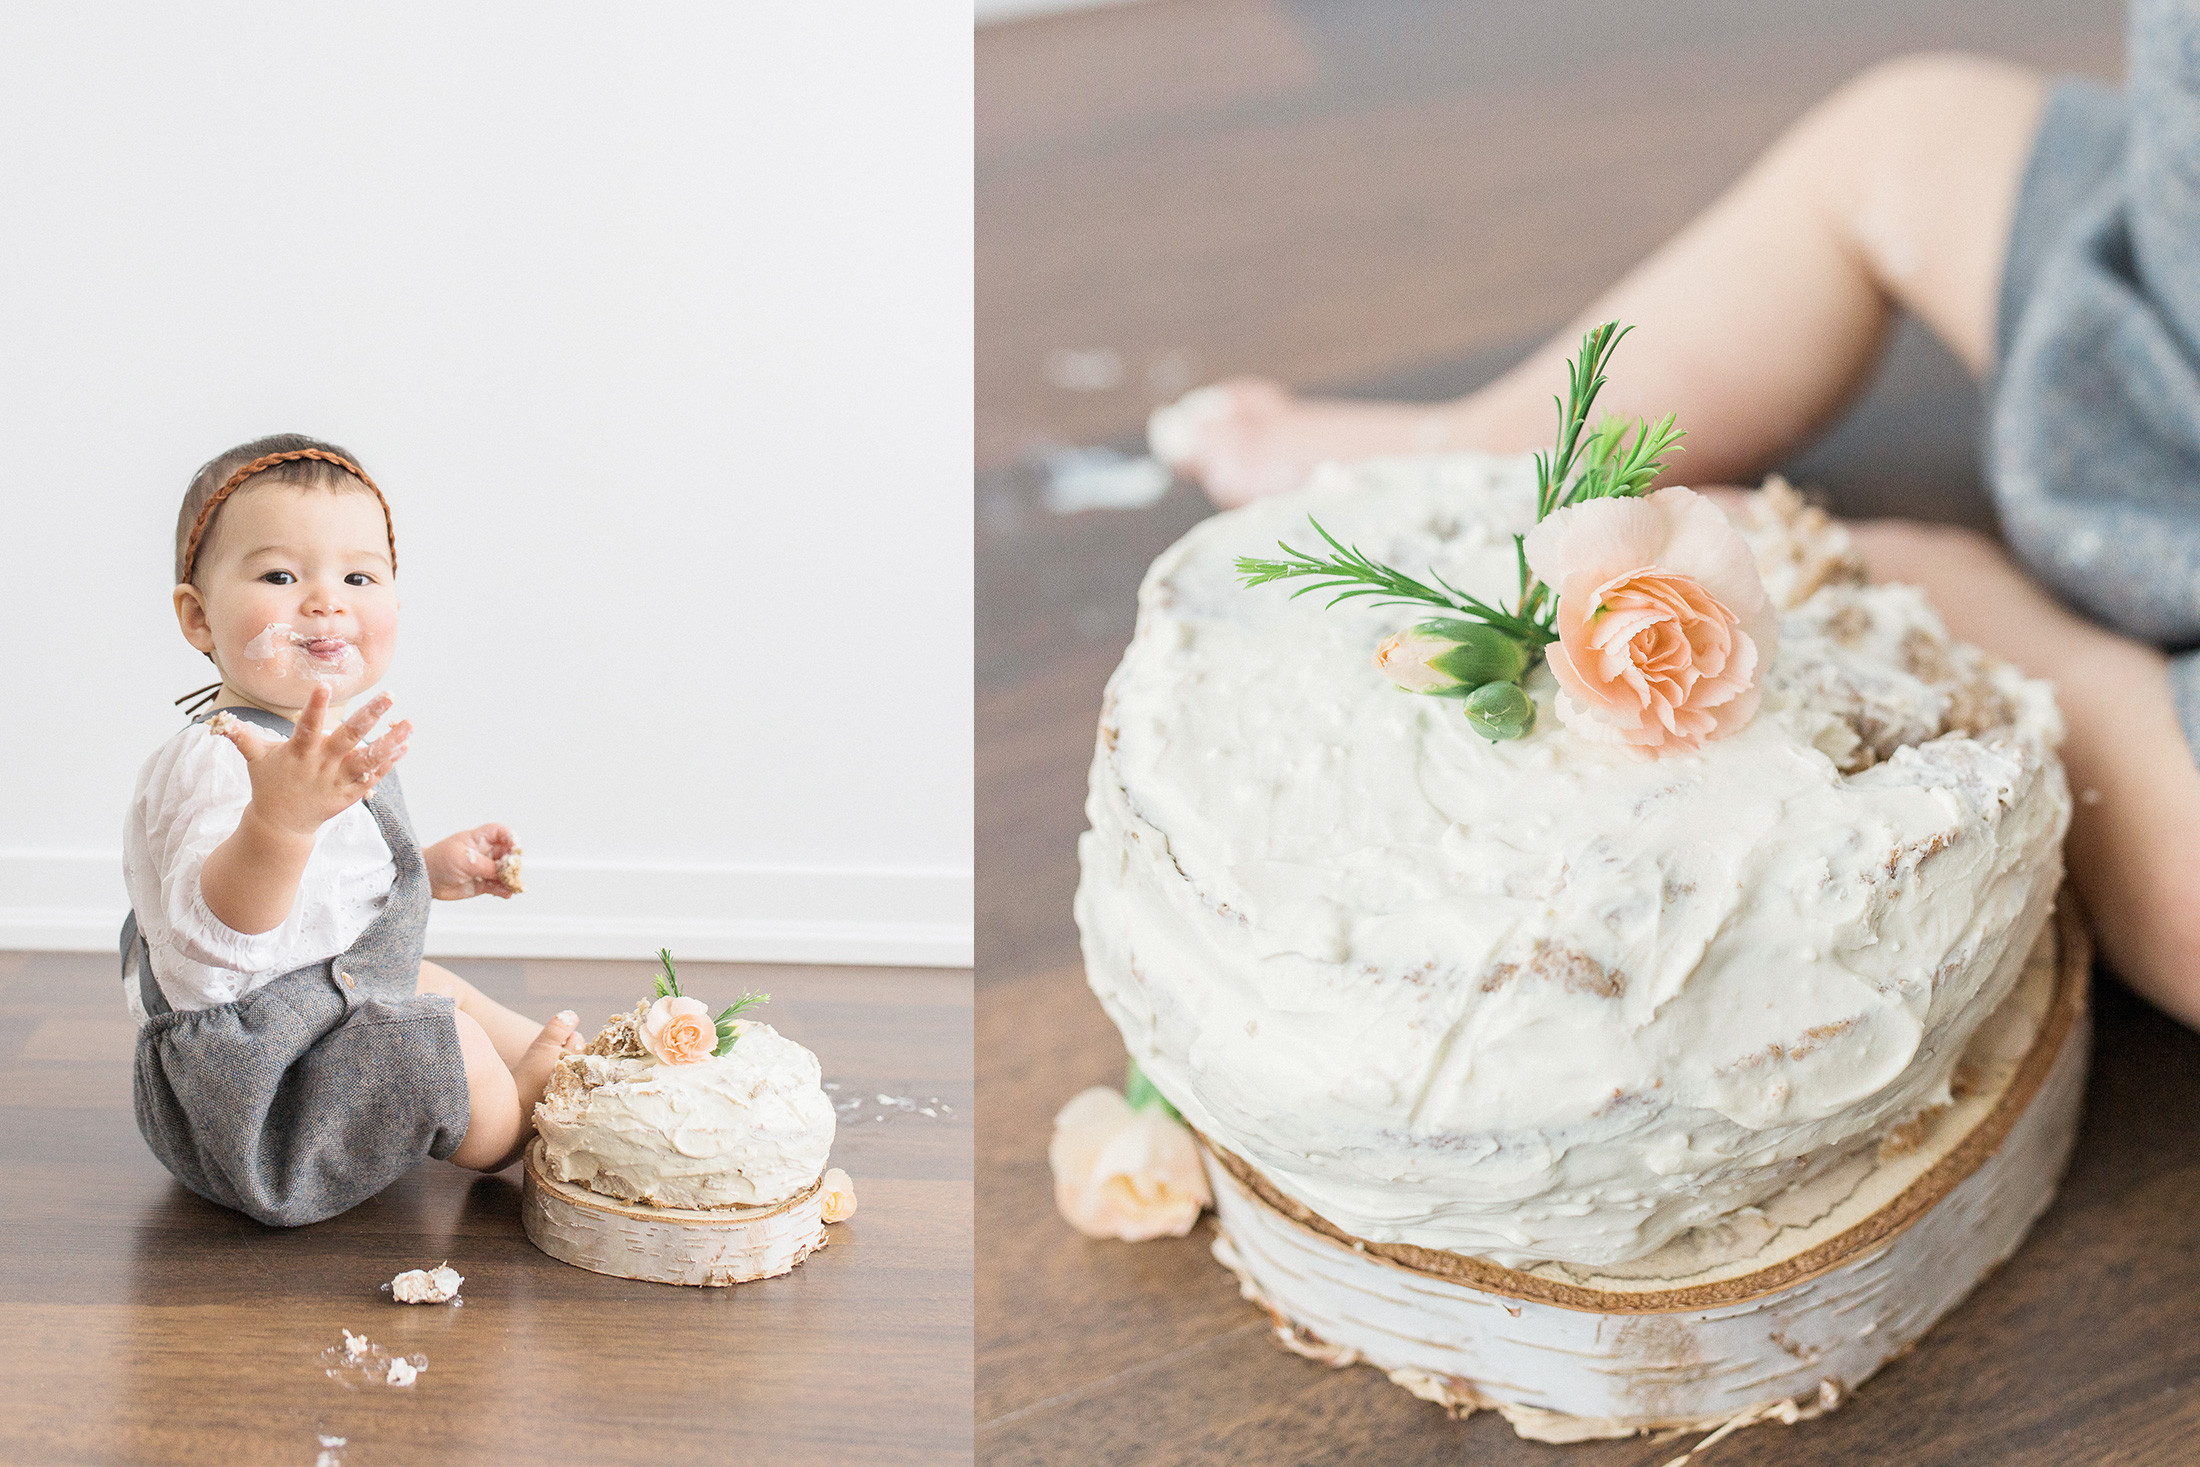 Healthy Smash Cake Recipe 1St Birthday  recipe healthy sugar free smash cake for baby s birthday